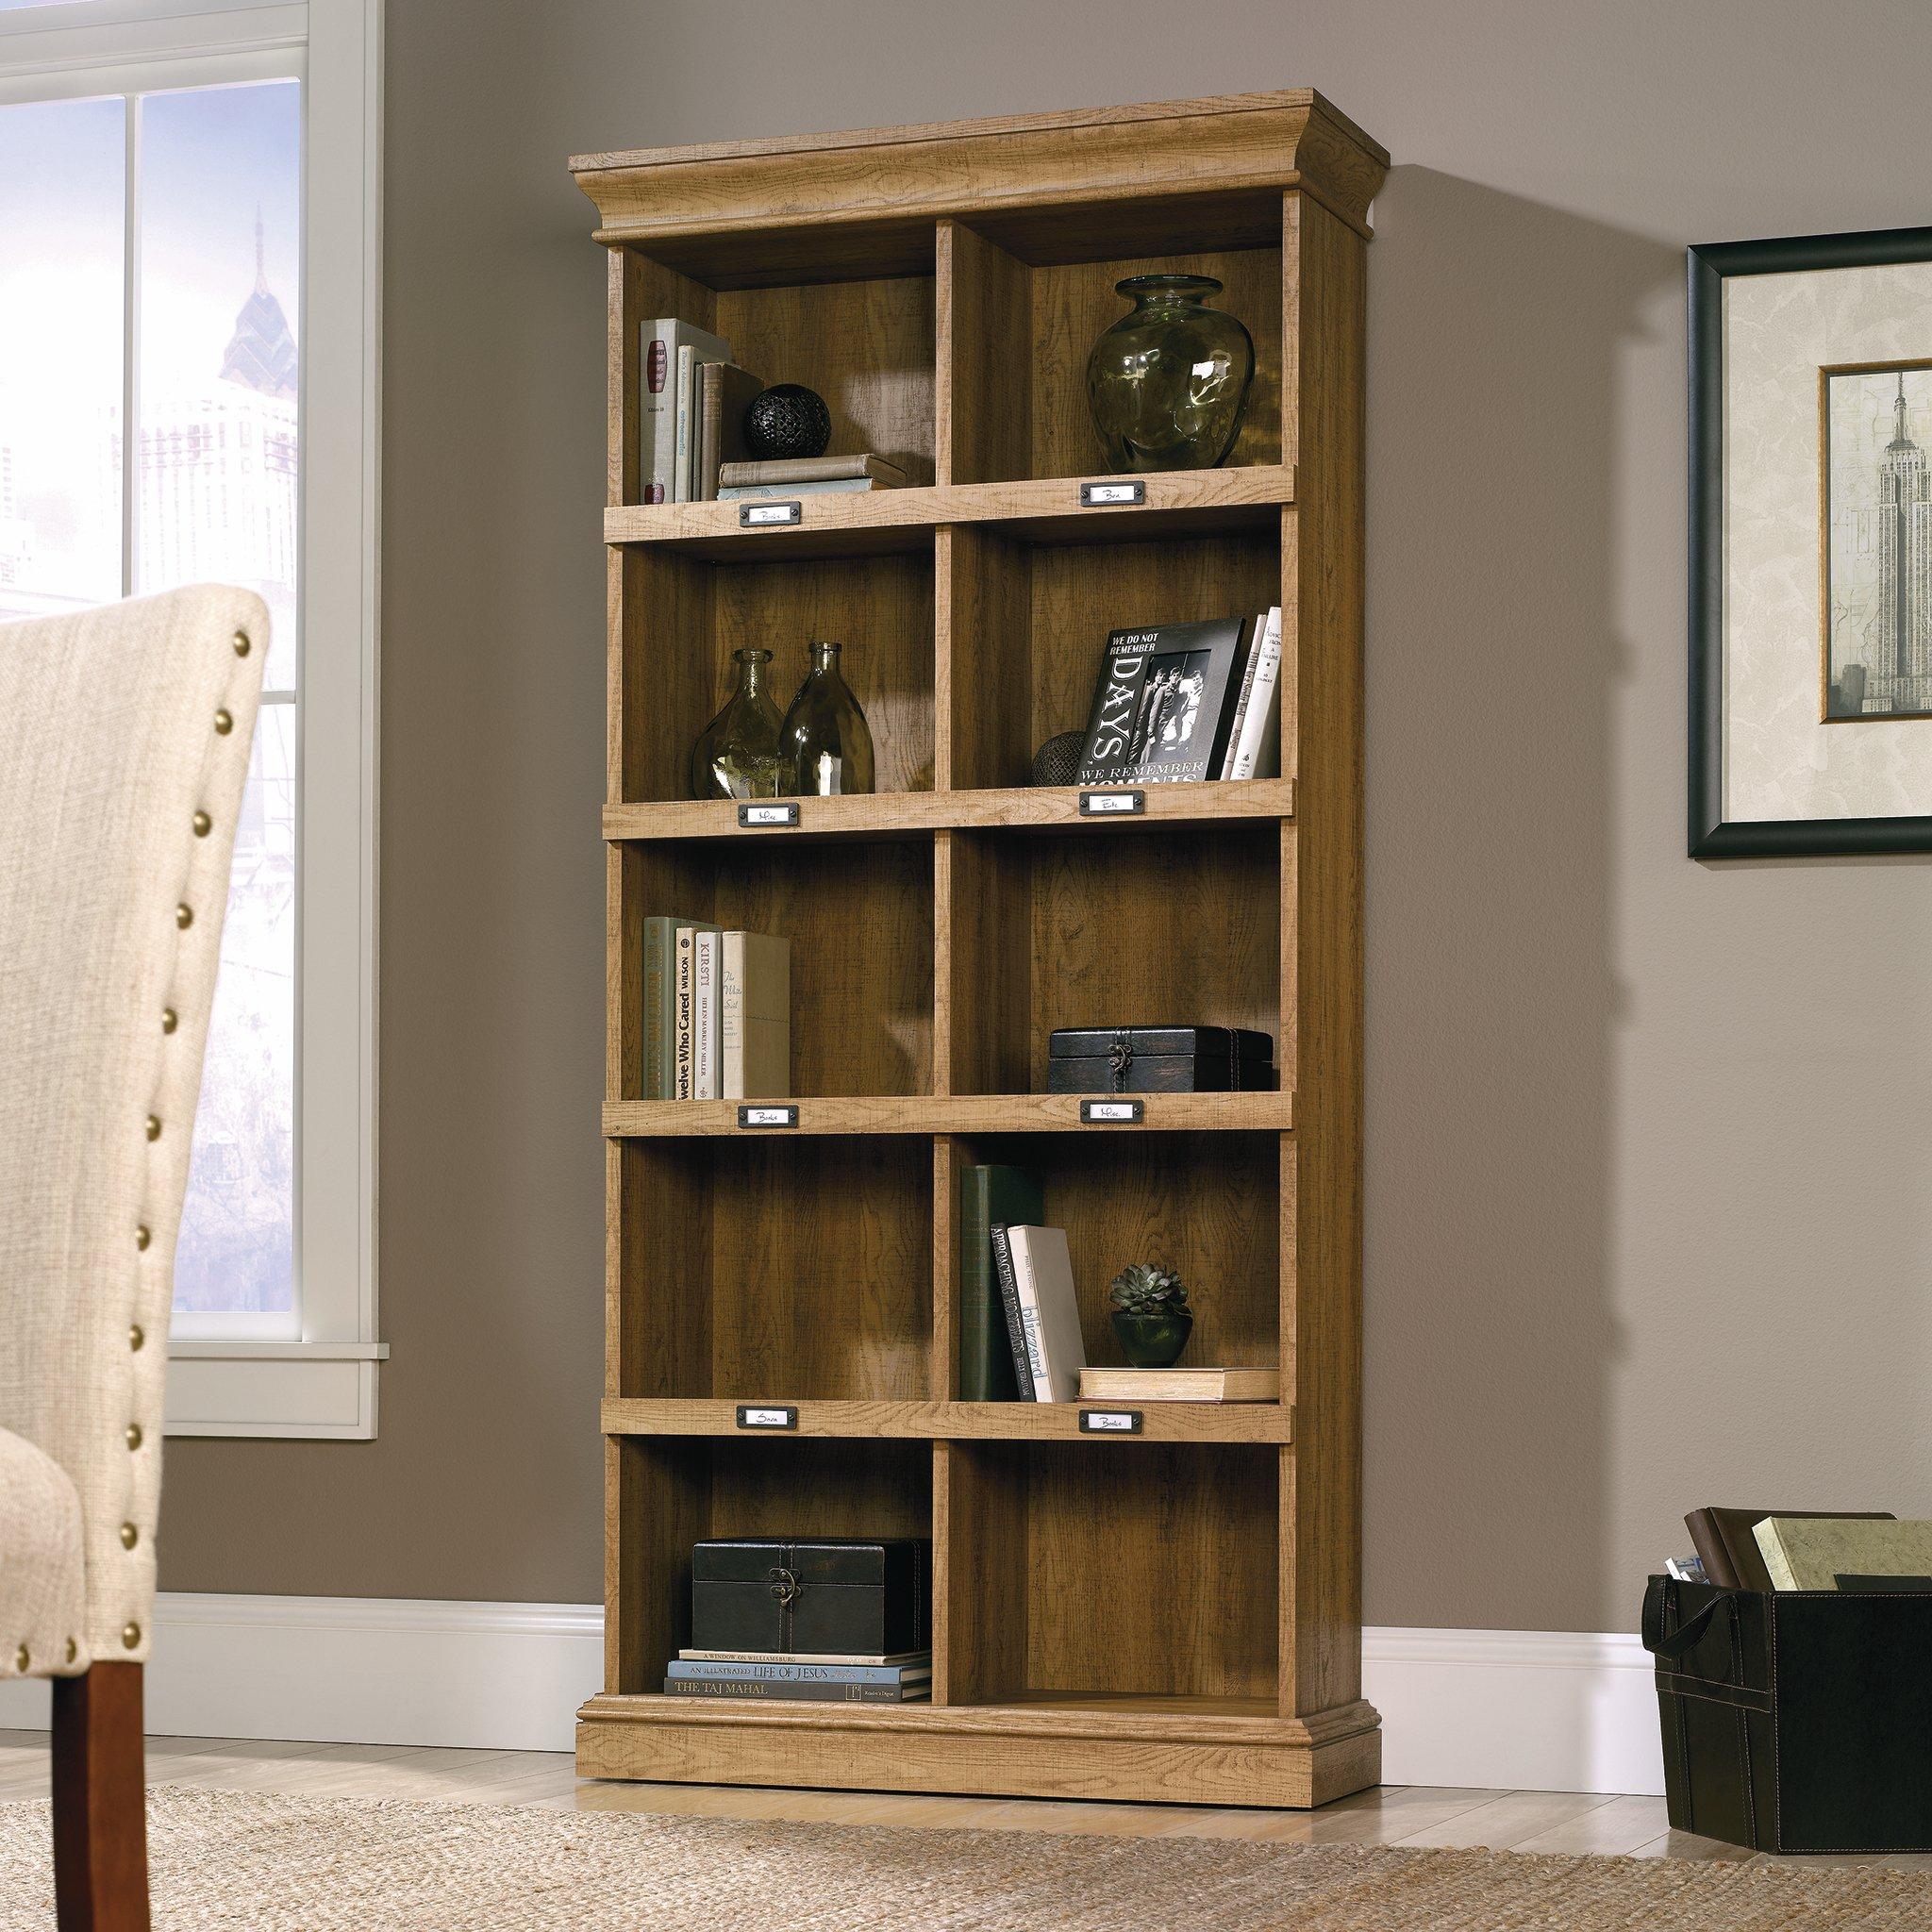 Sauder 414725 Barrister Lane Bookcase, L: 35.55'' x W: 13.50'' x H: 75.04'', Scribed Oak finish by Sauder (Image #5)